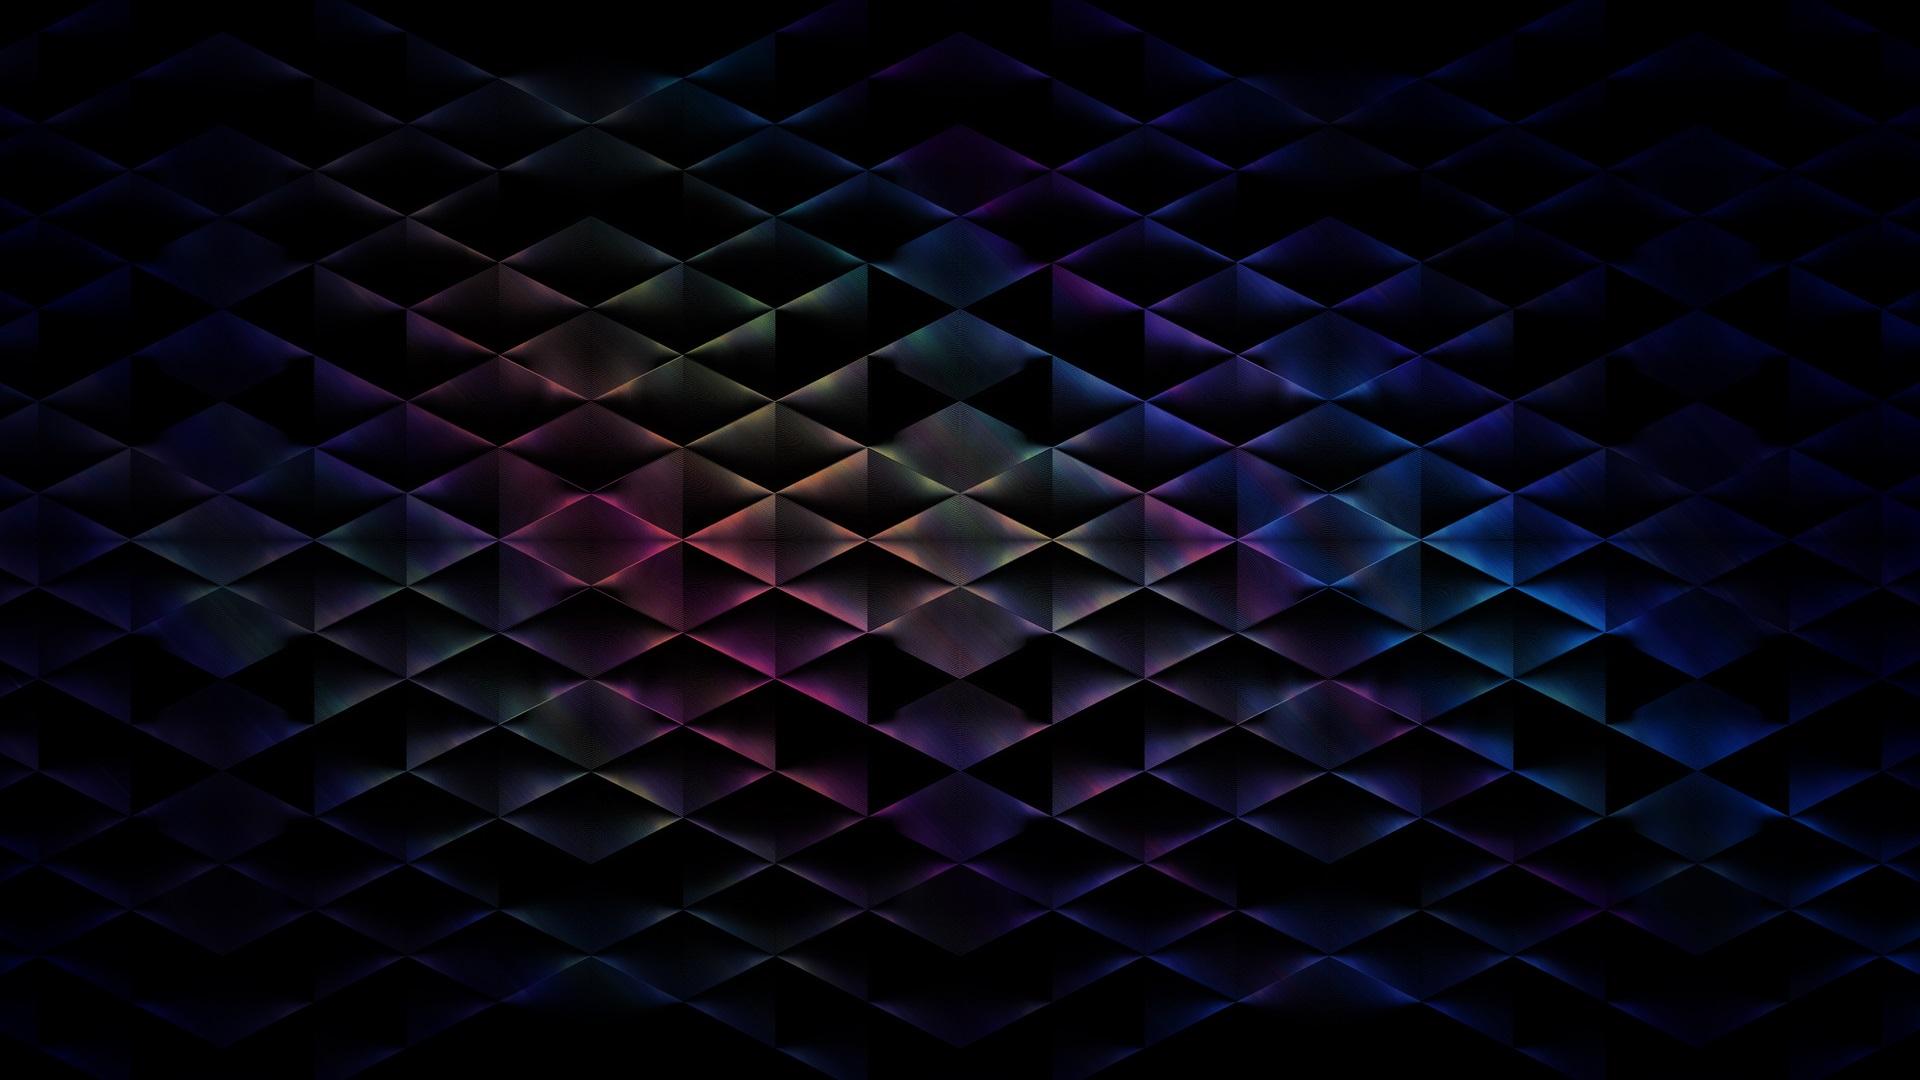 colorful diamond wallpaper